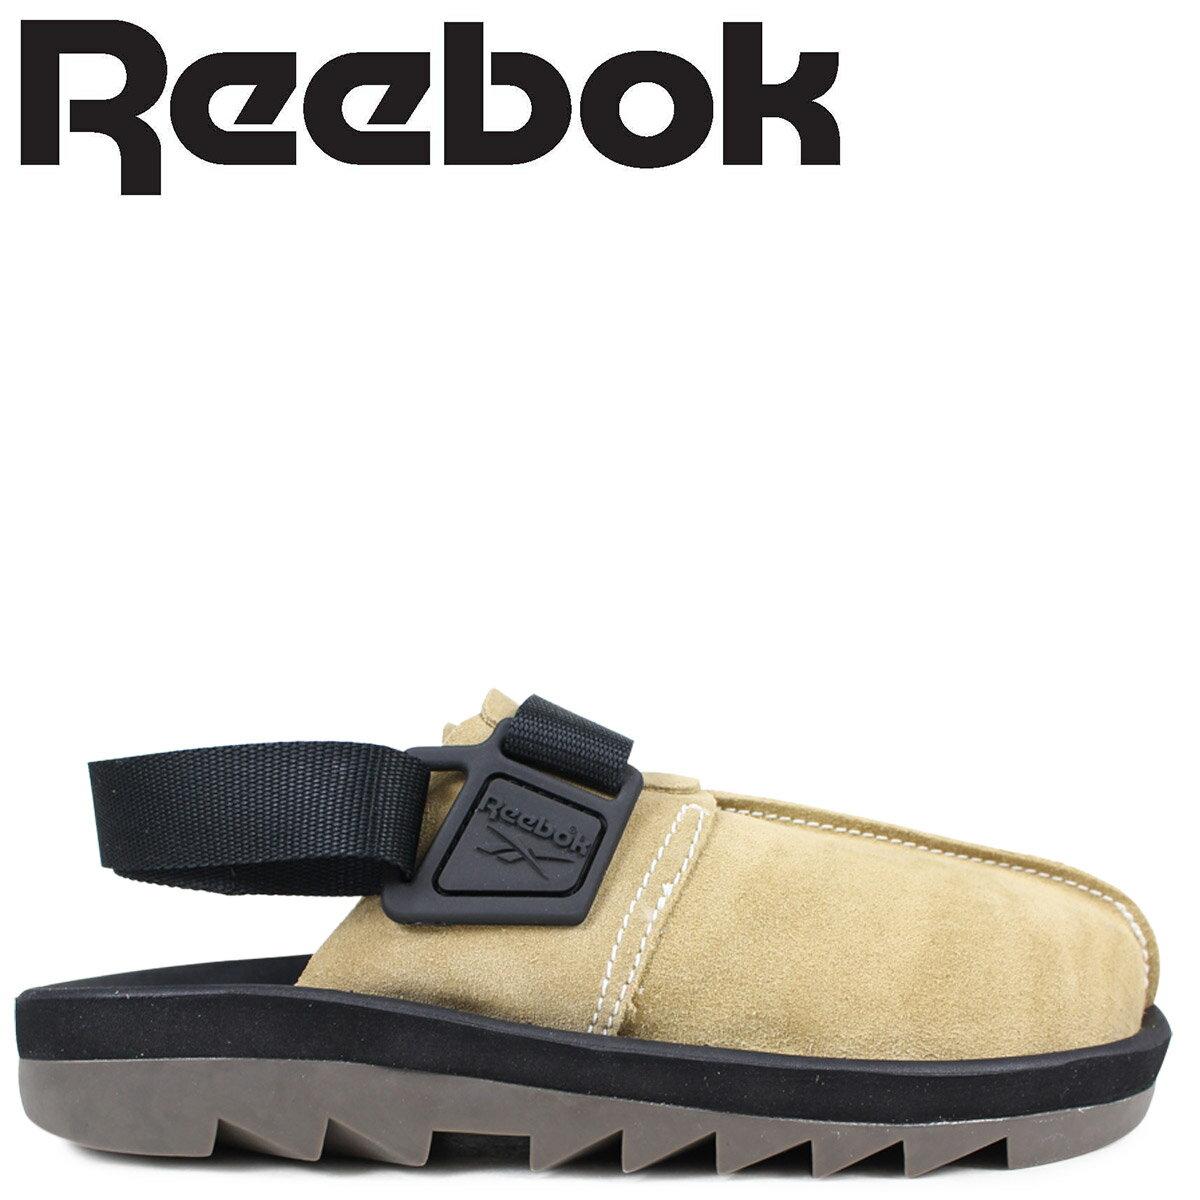 Reebok ビートニック レディース メンズ サンダル リーボック BEATNIK CN3731 ブラウン [3/16 新入荷]